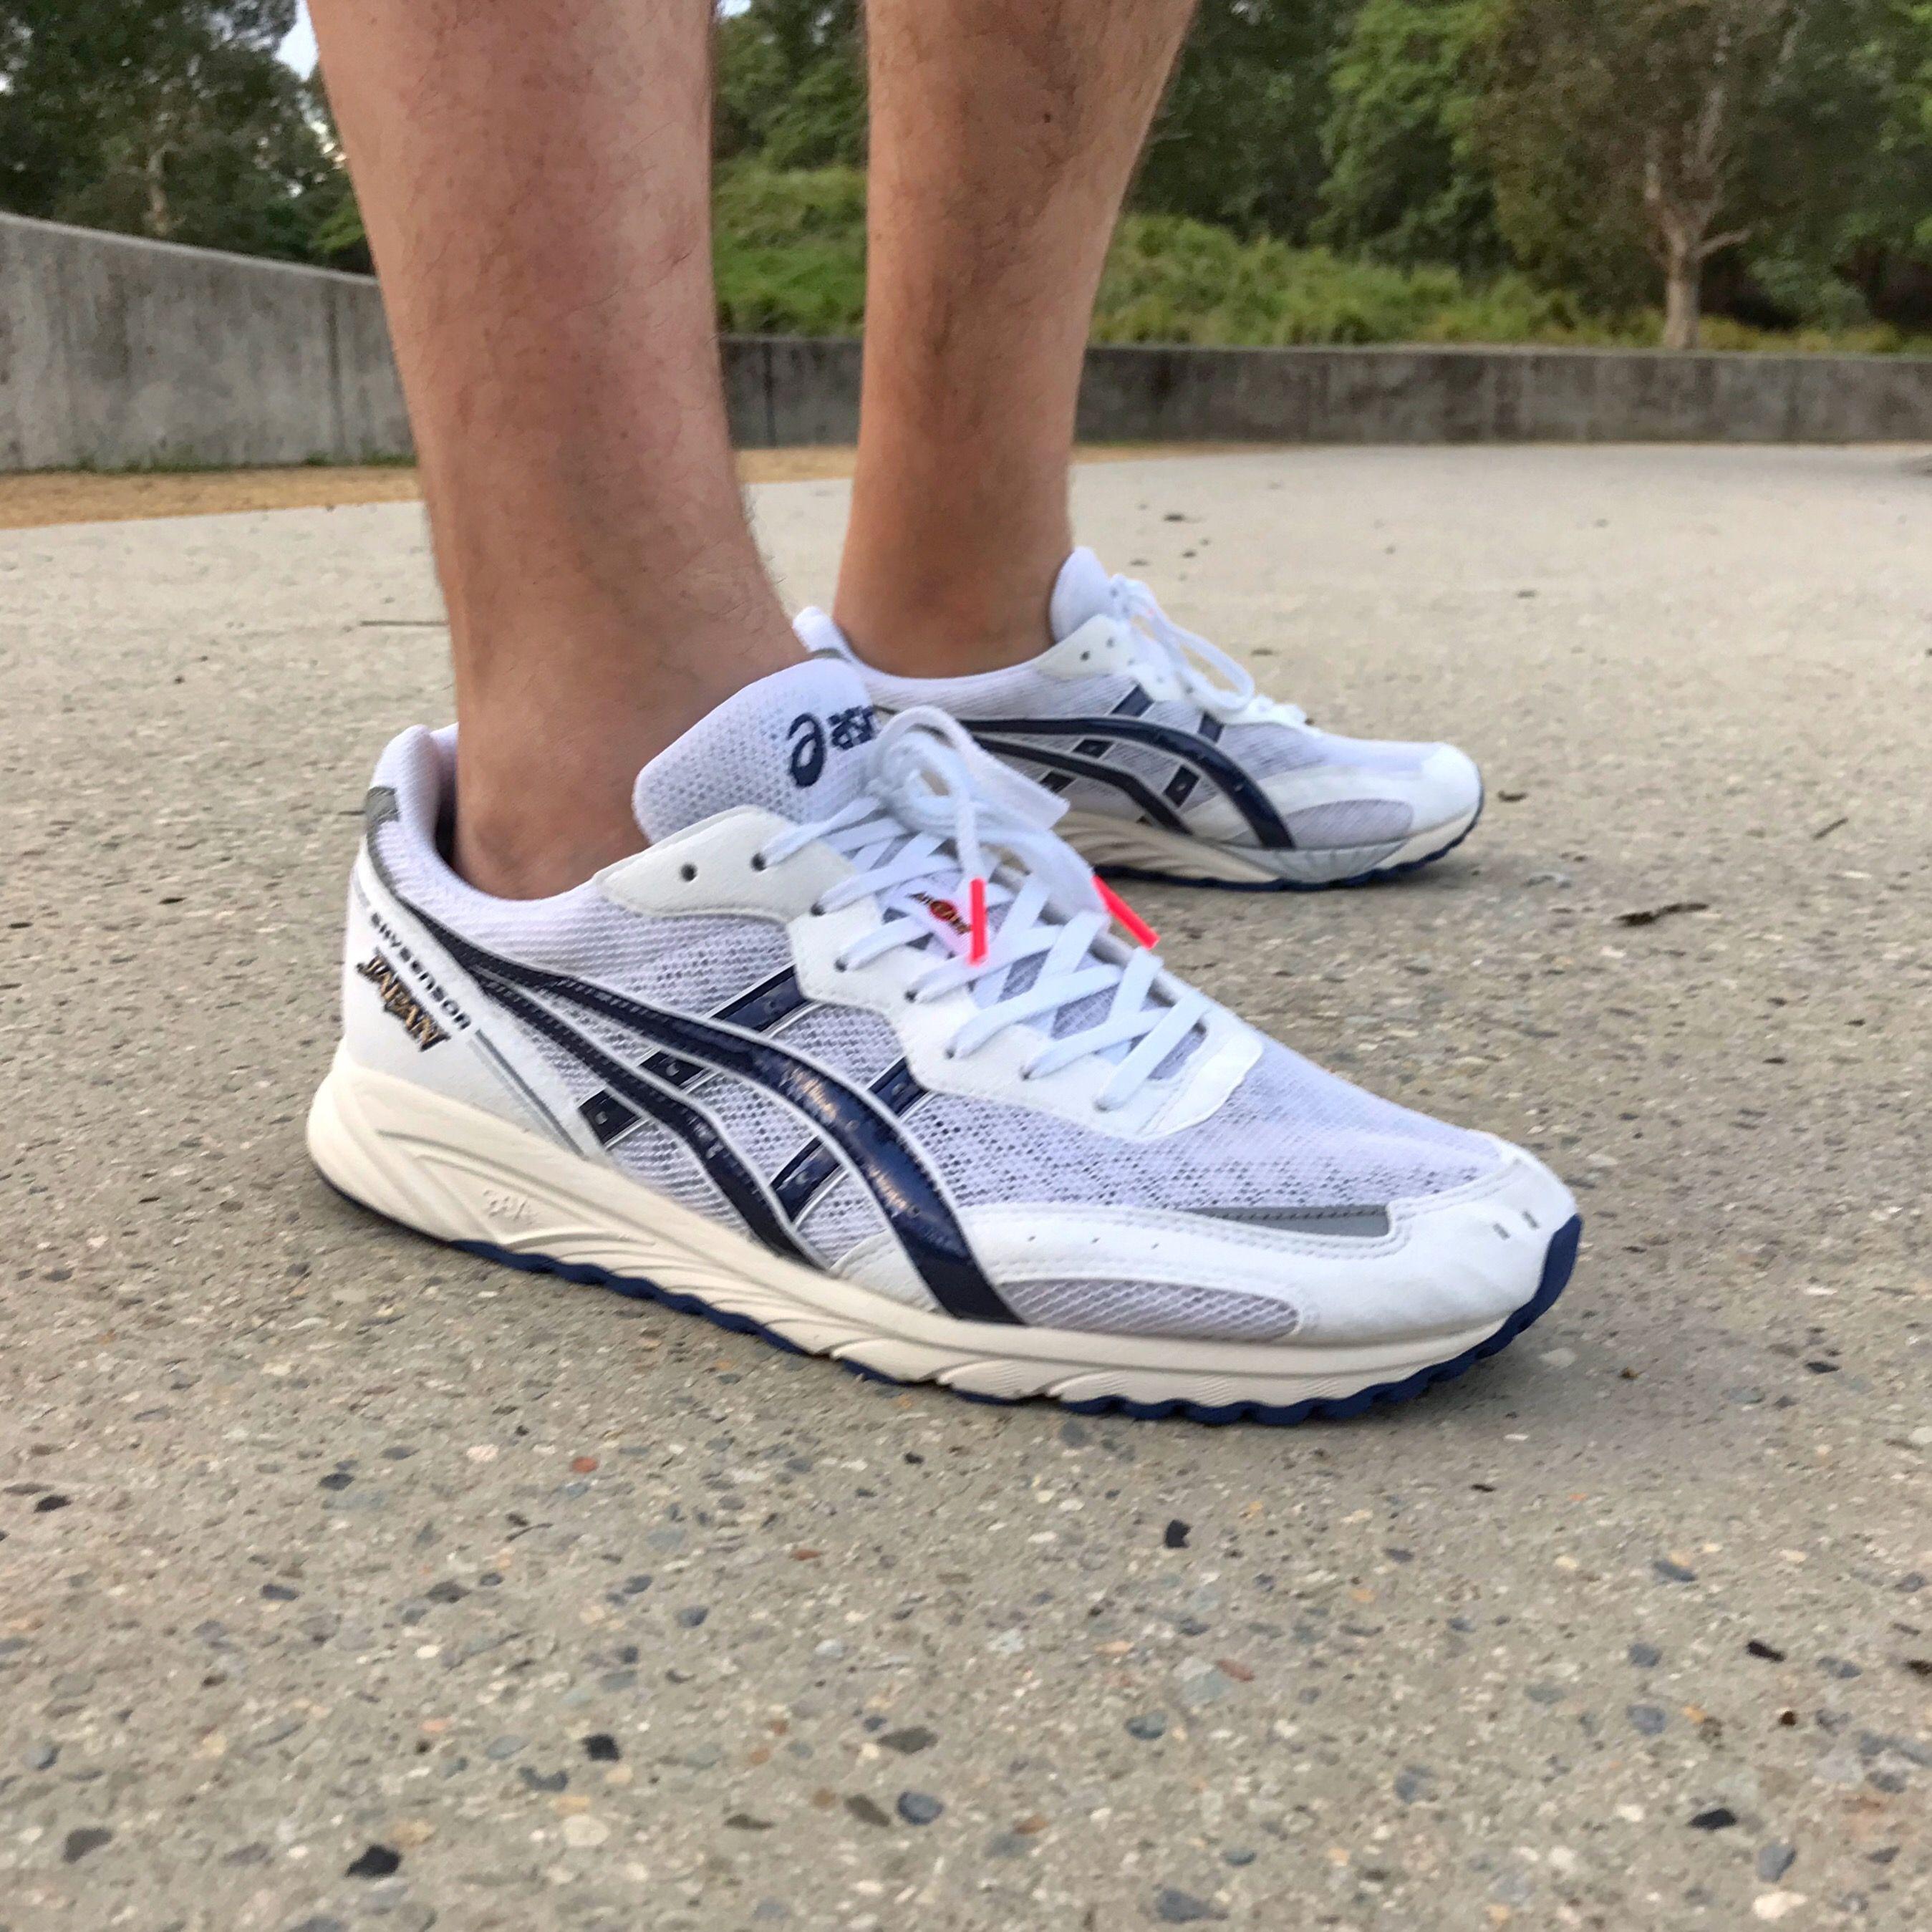 asics walking shoes japan precio